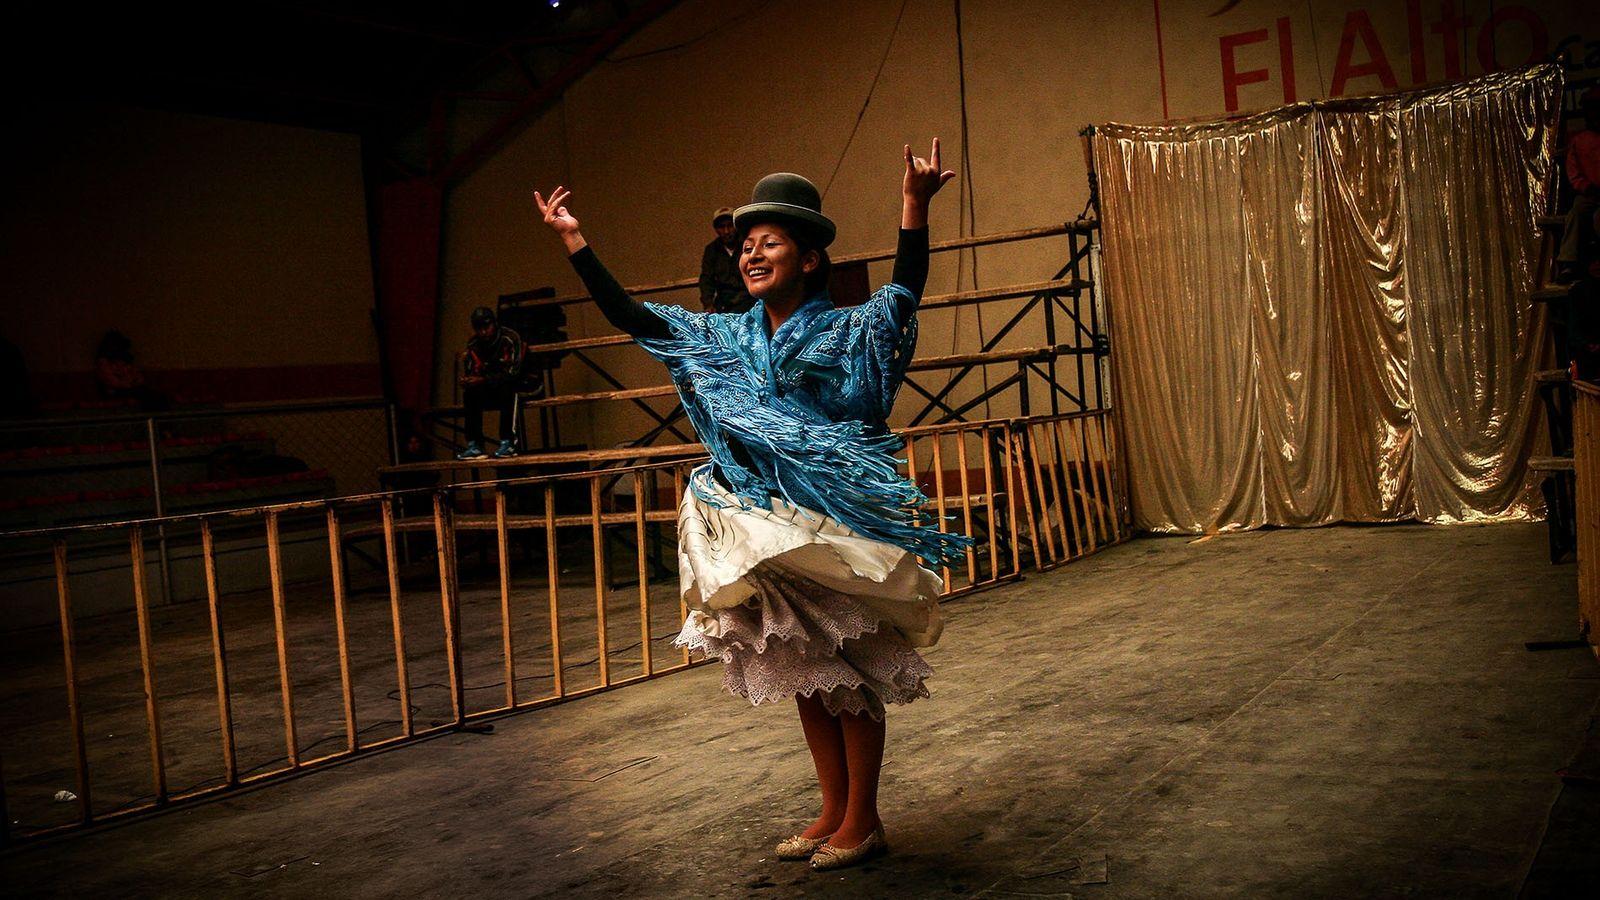 Cholita wrestler, El Alto, Bolivia